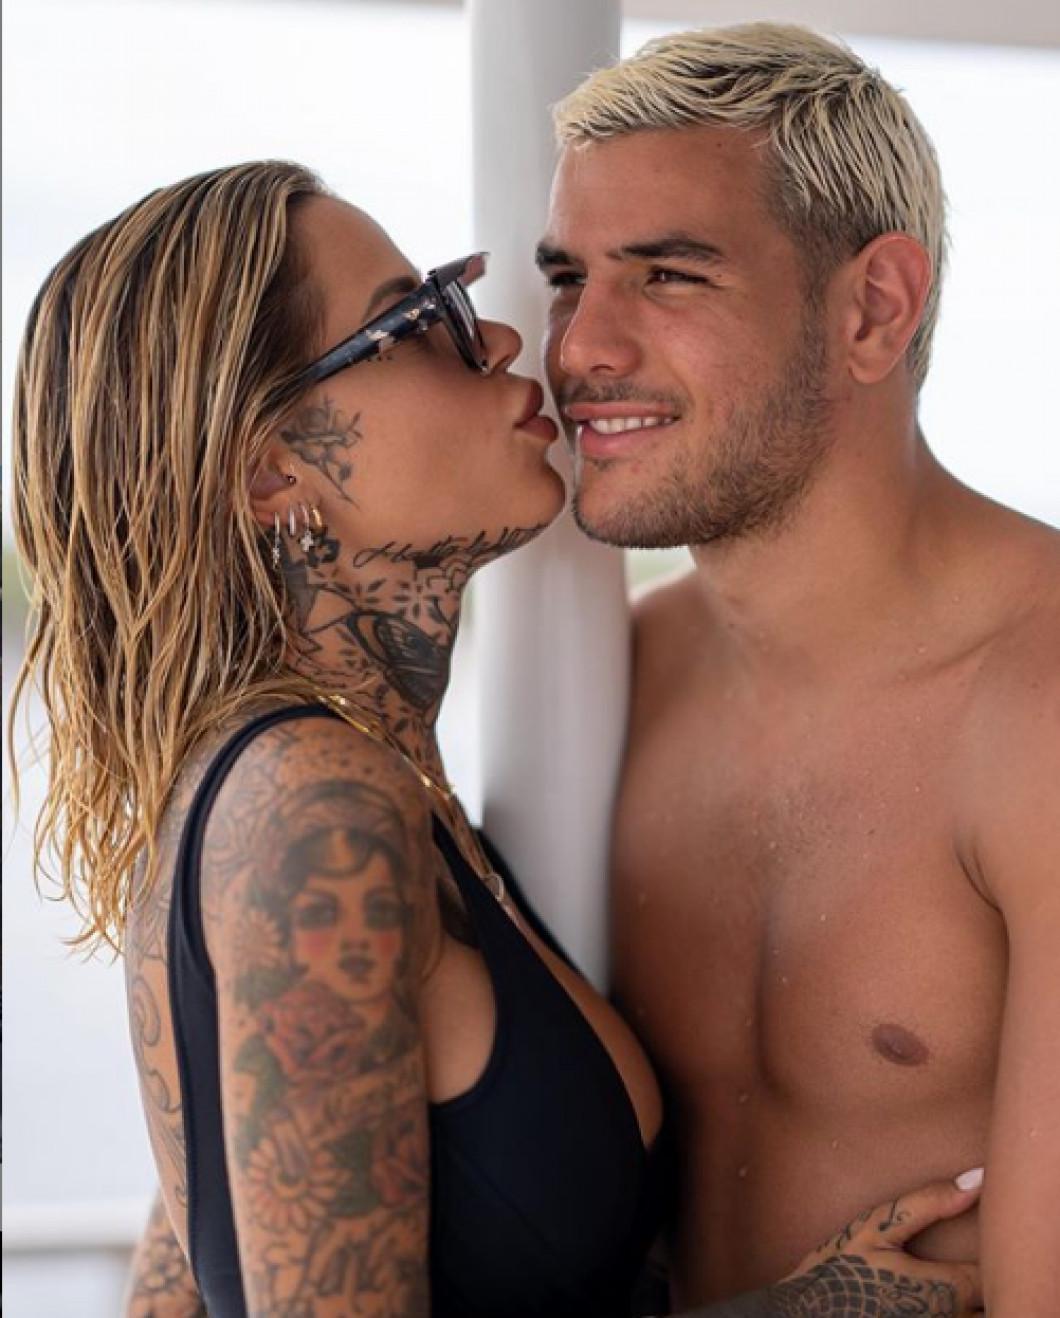 Zoe Cristofoli, iubita lui Theo Hernandez / Foto: Instagram/Zoe Cristofoli